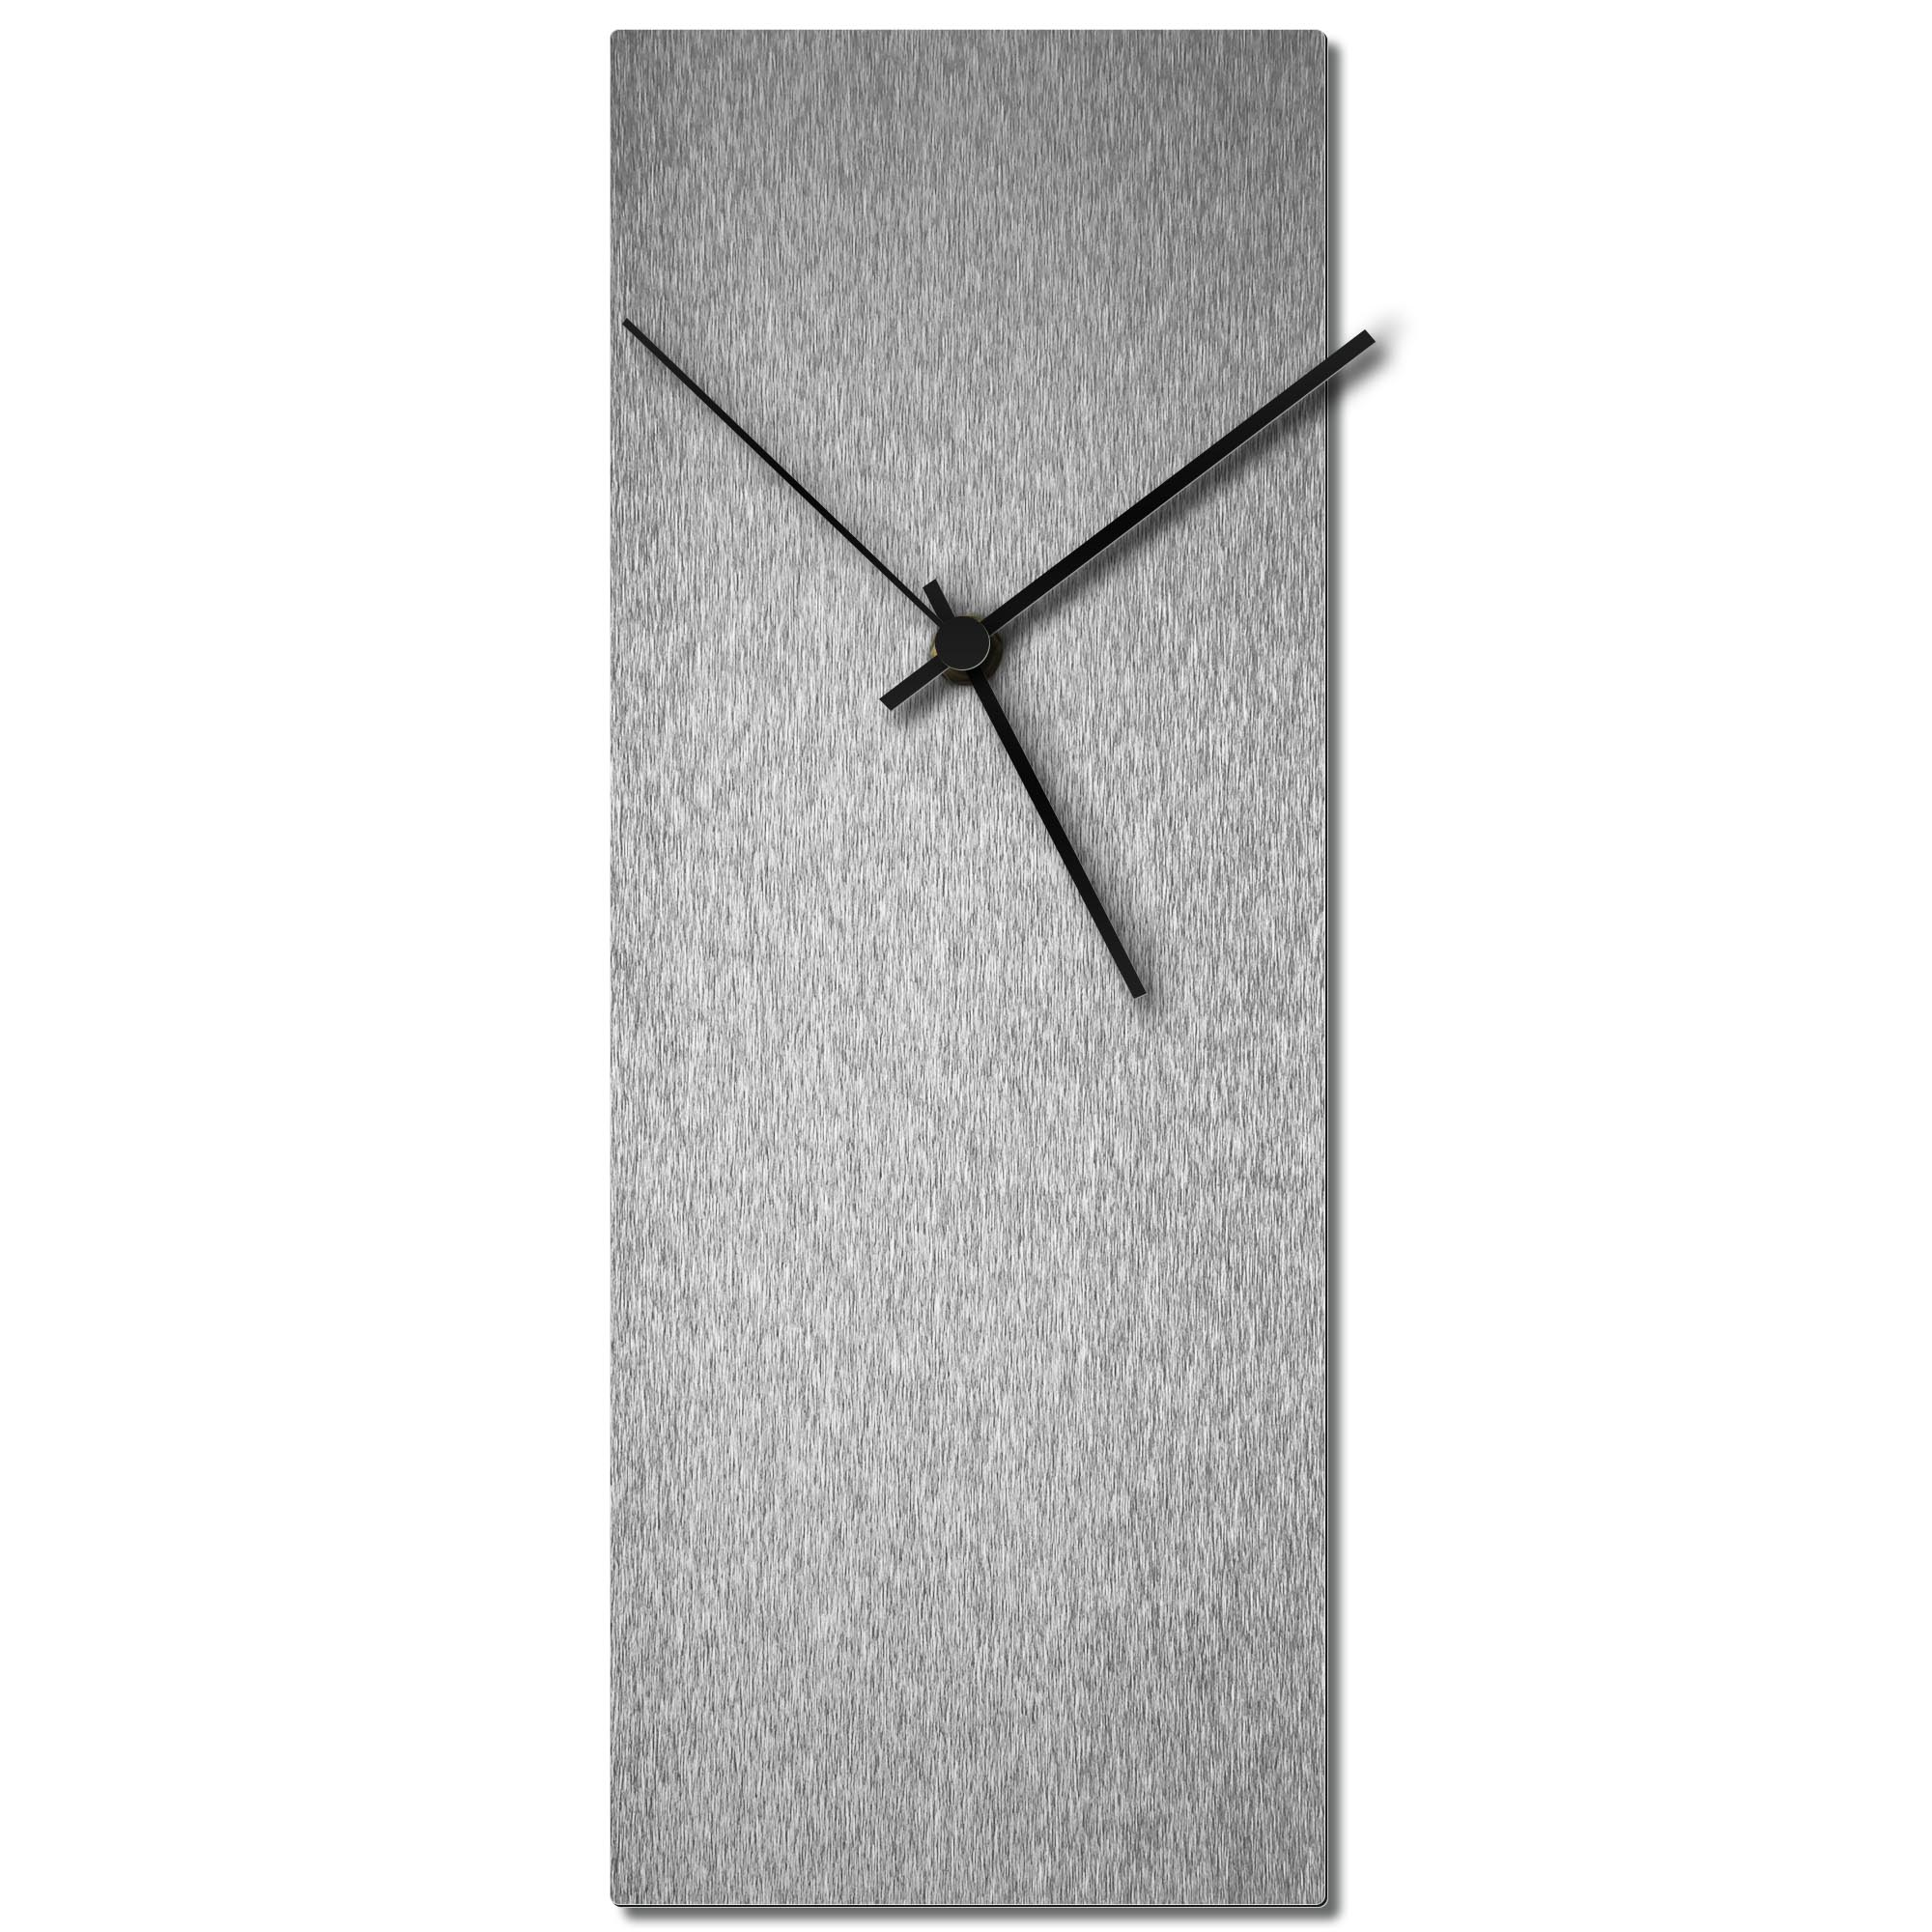 Adam Schwoeppe 'Silversmith Clock Black' Midcentury Modern Style Wall Clock